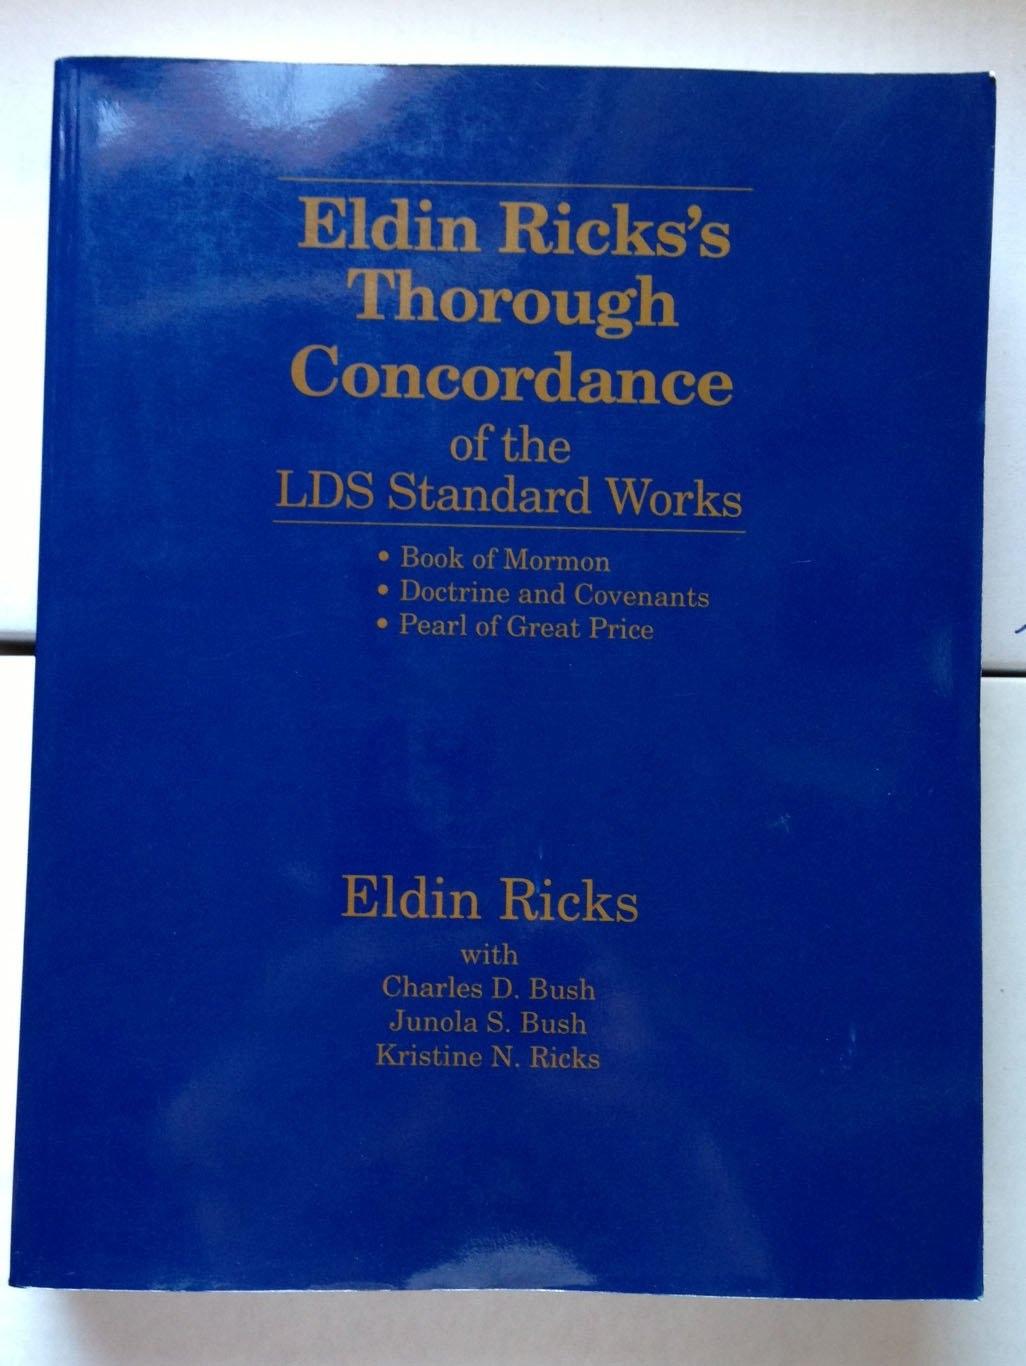 Eldin Ricks's Thorough Concordance of the LDS Standard Works, Eldin Ricks, Kristine N. Ricks, Charles D Bush; Junola S. Bush